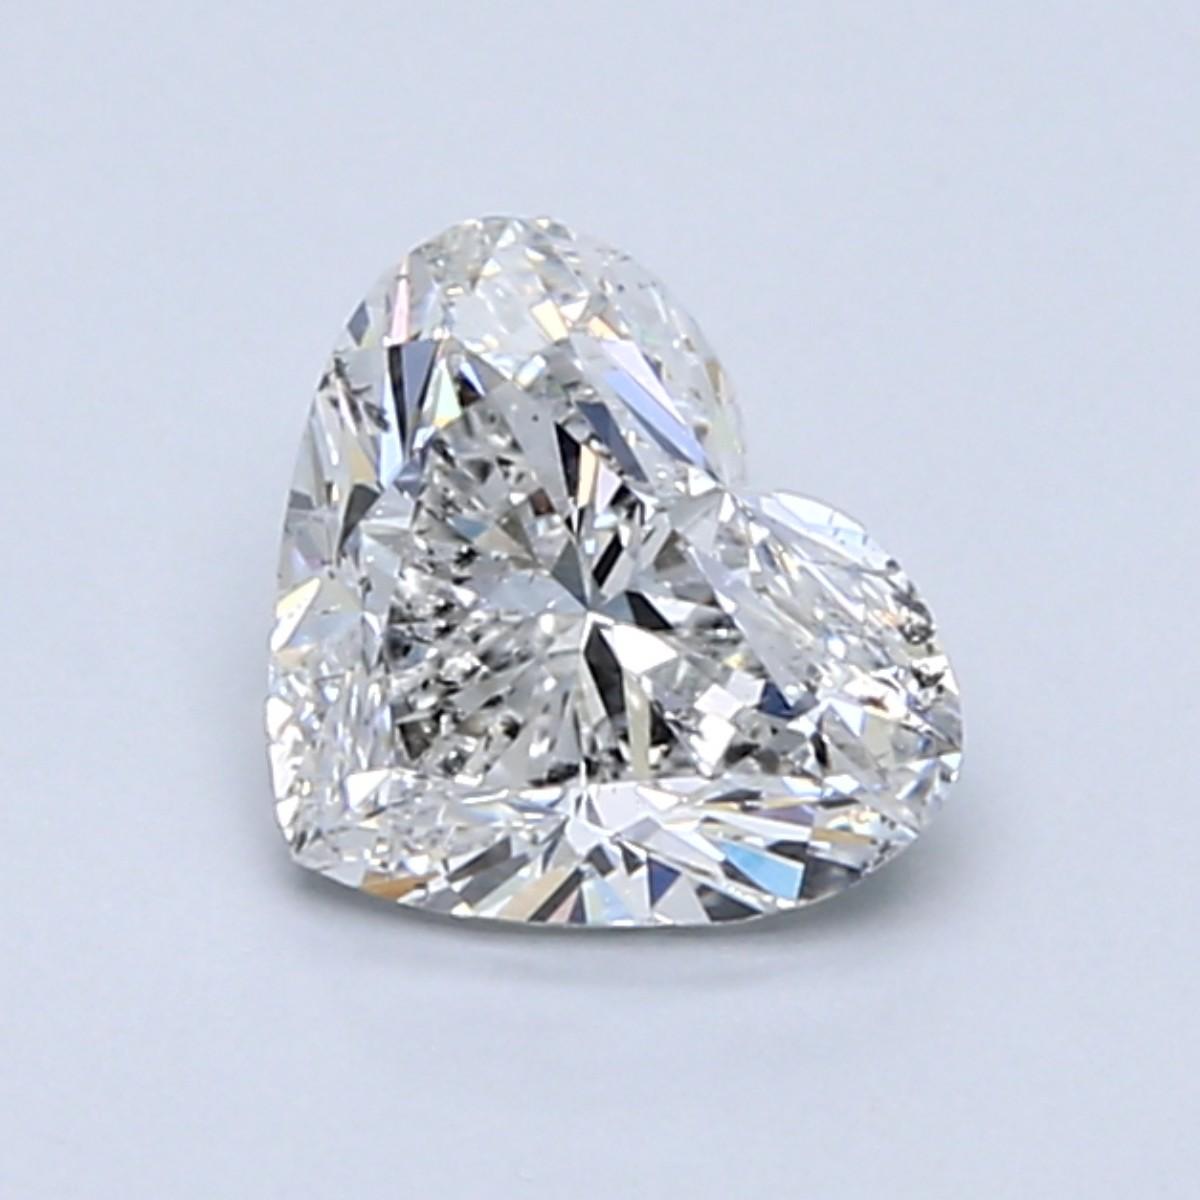 Blue Nile 1.00克拉 心形钻石(切工VG,成色D,净度SI2)